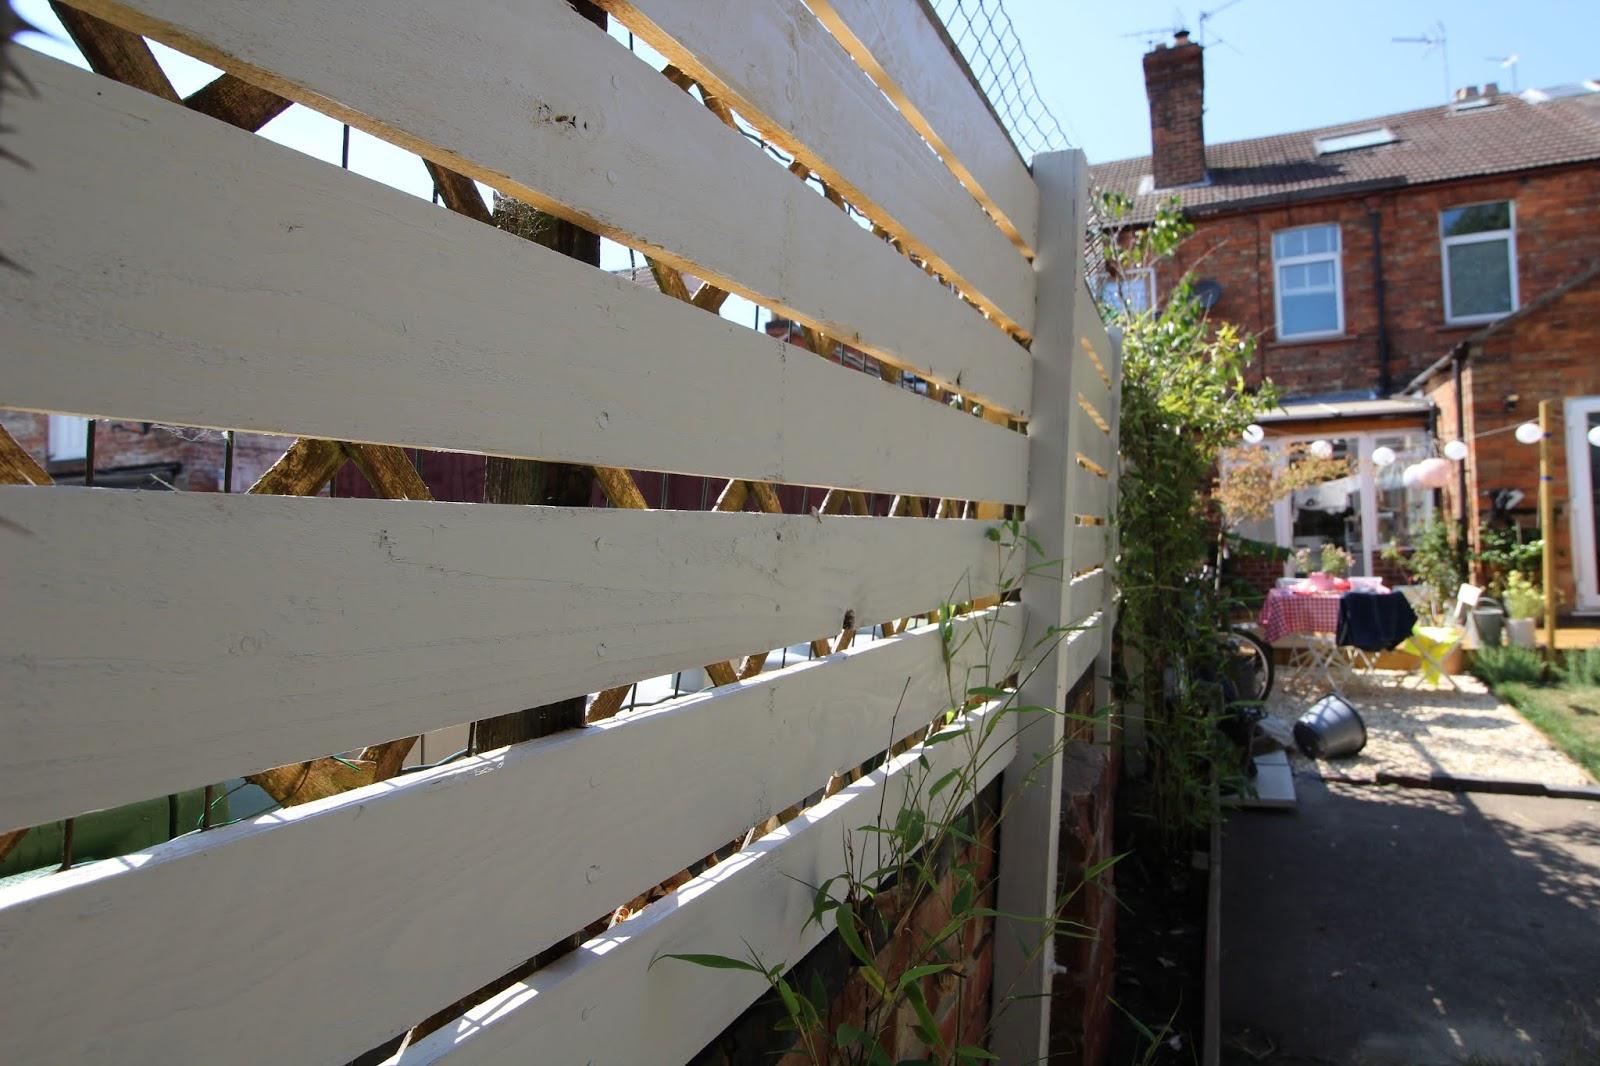 DIY Modern Slat Fence